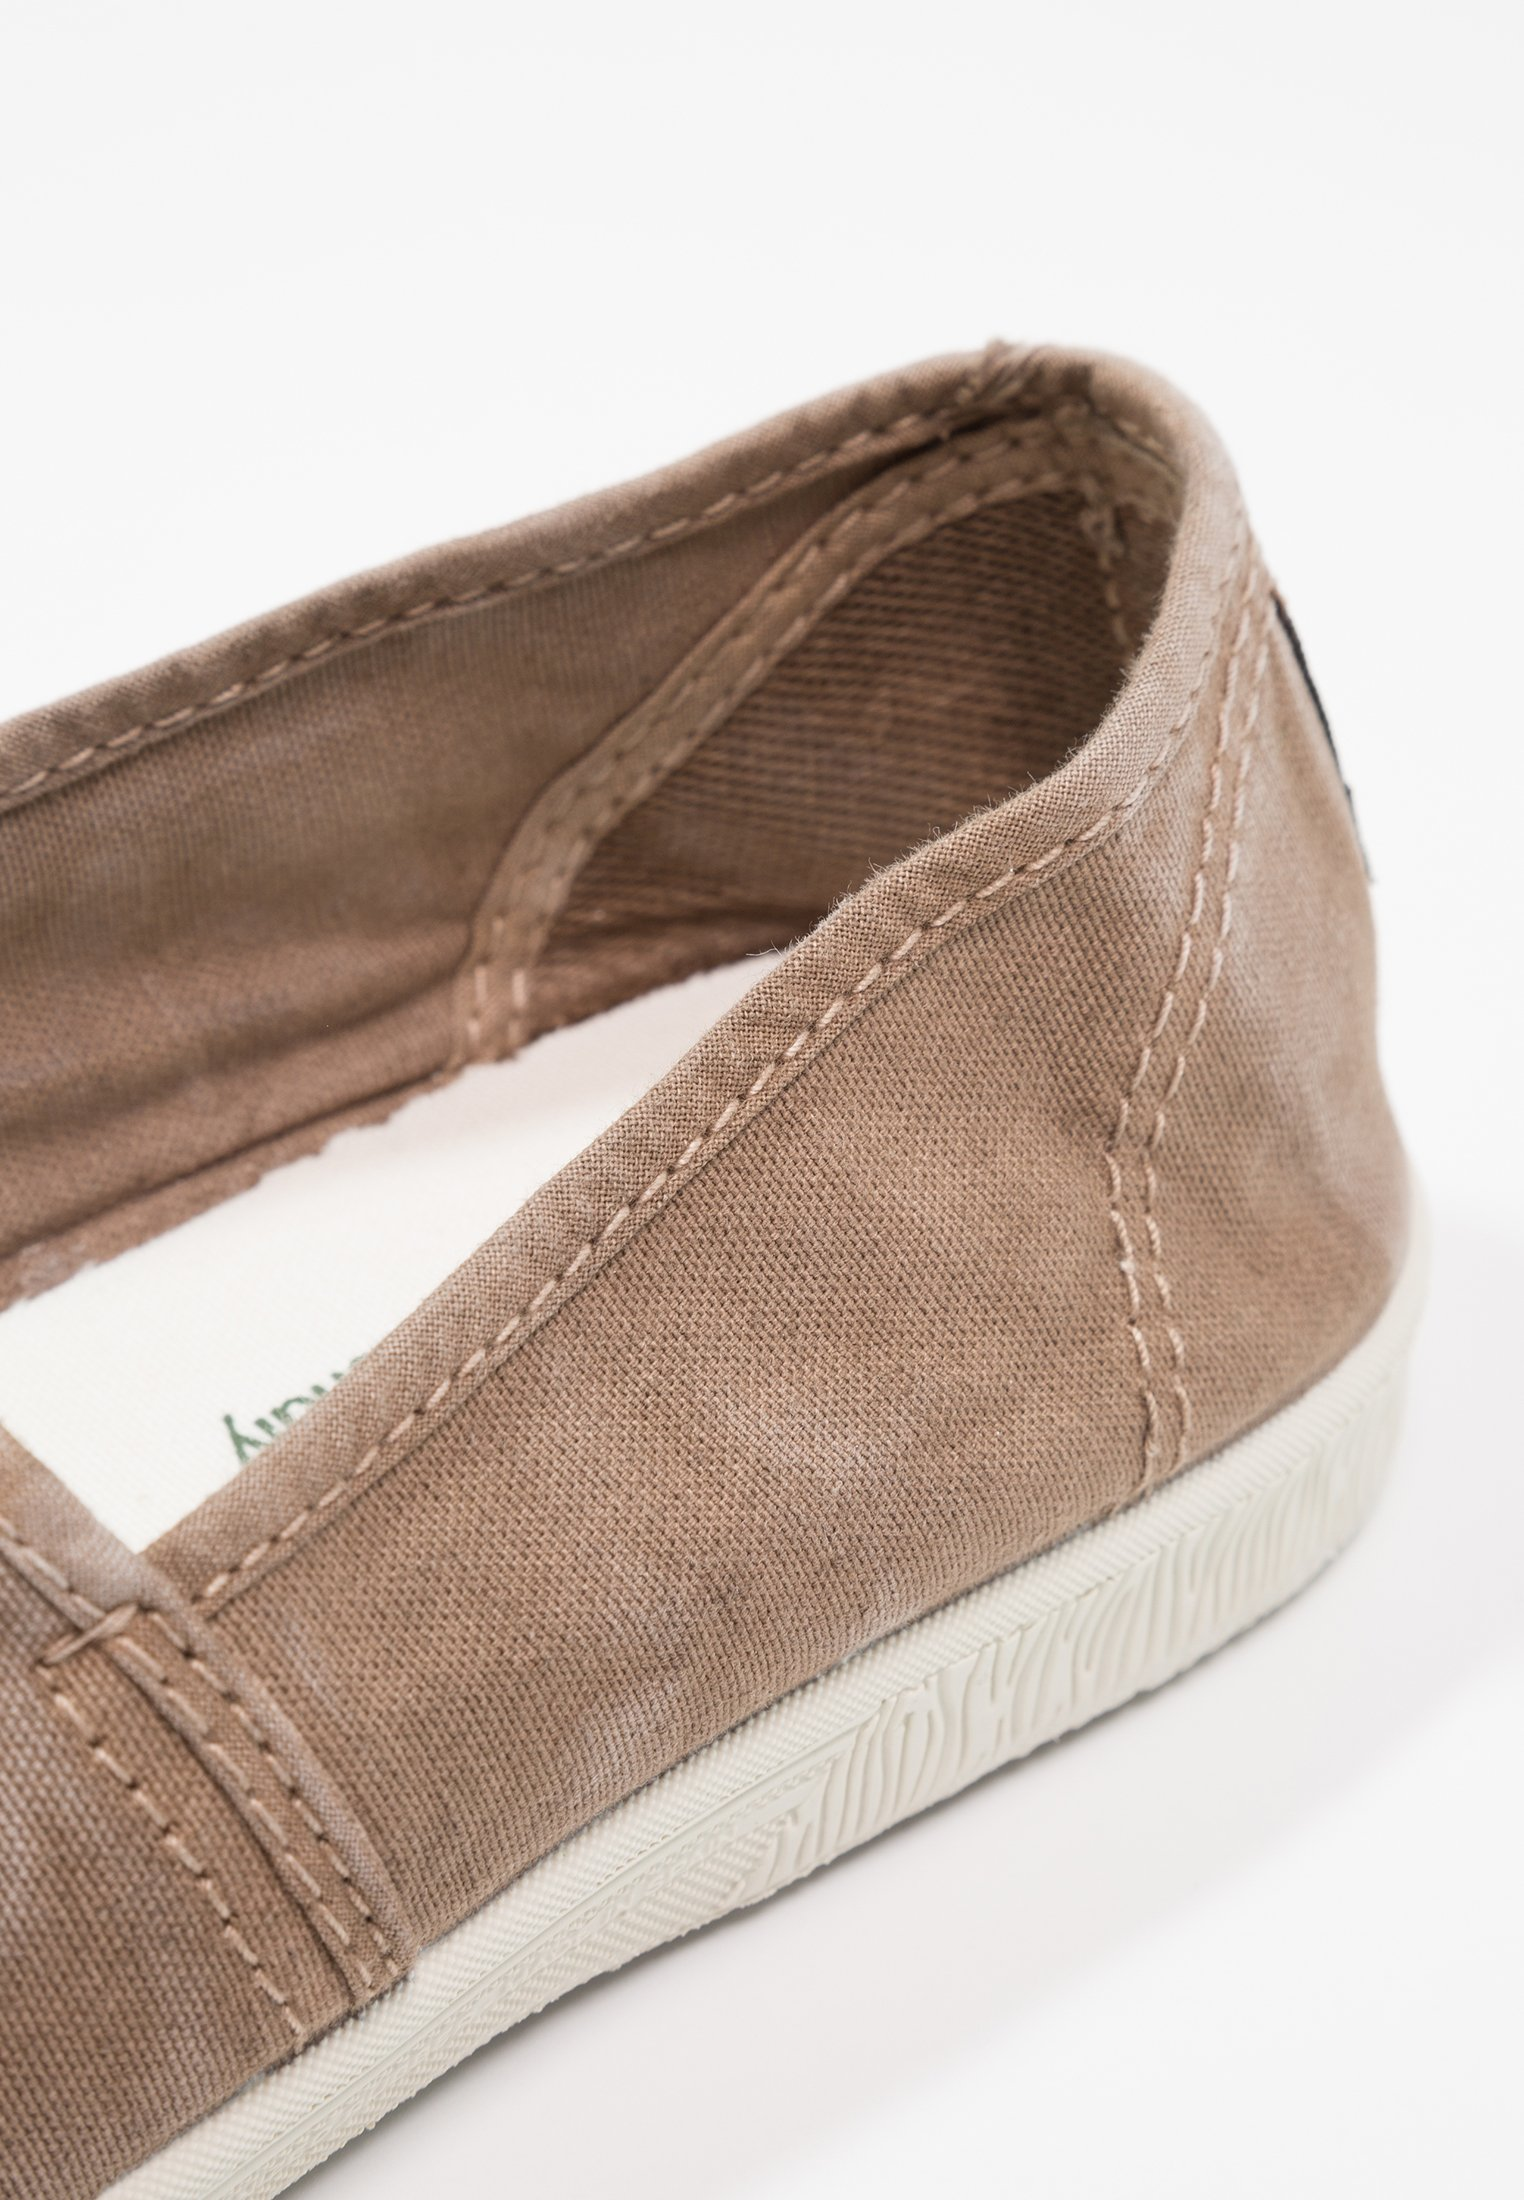 Natural World CAMPING  - Mocassins - beige - Sneakers femme Grande vente